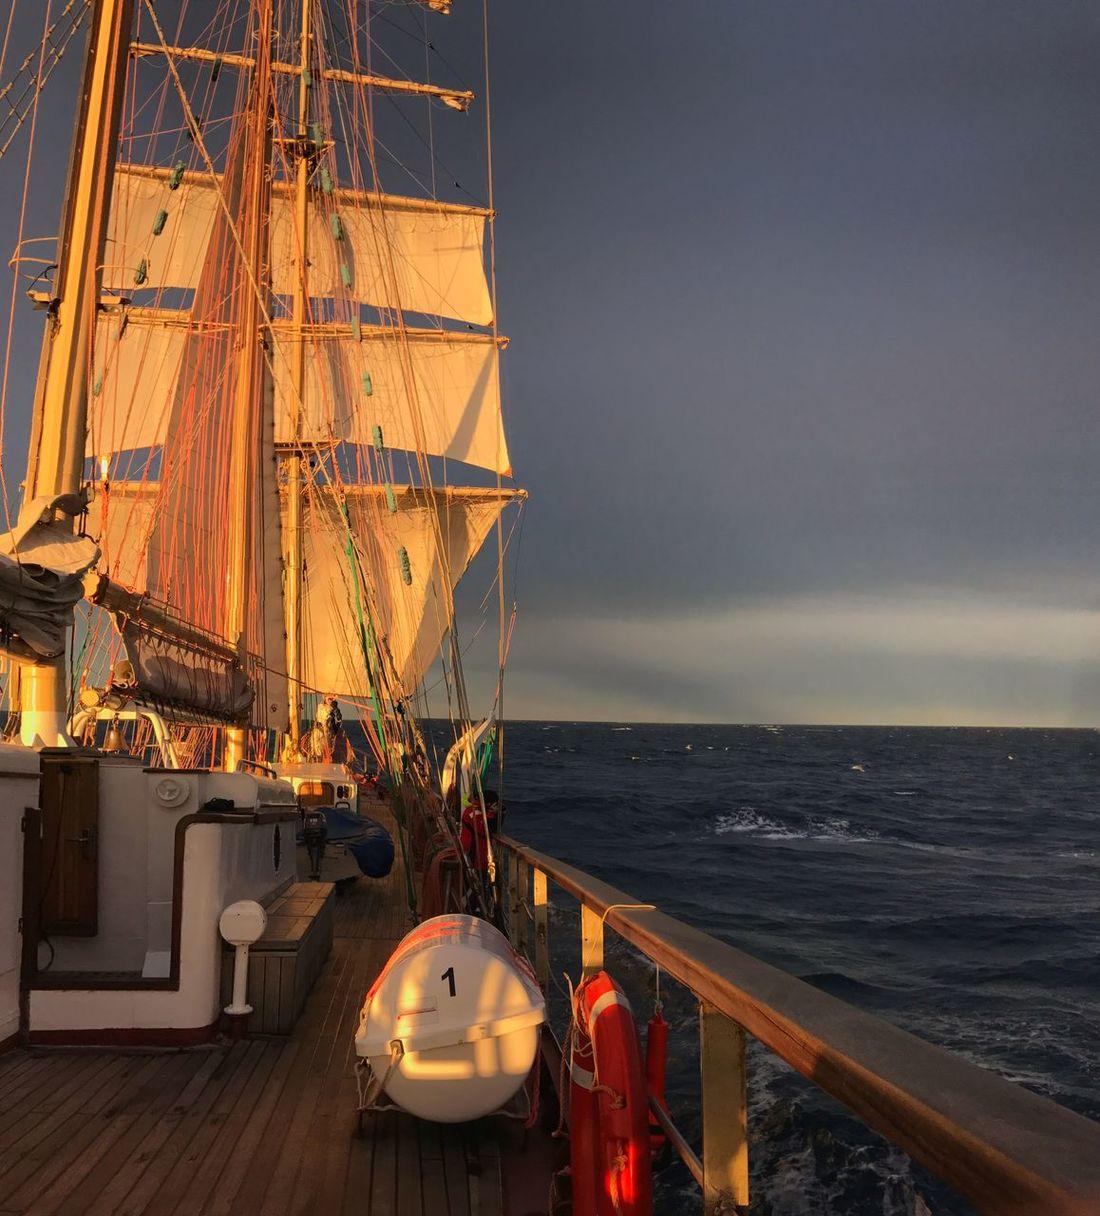 27.04.17 Pogoria Sunlight Sailing